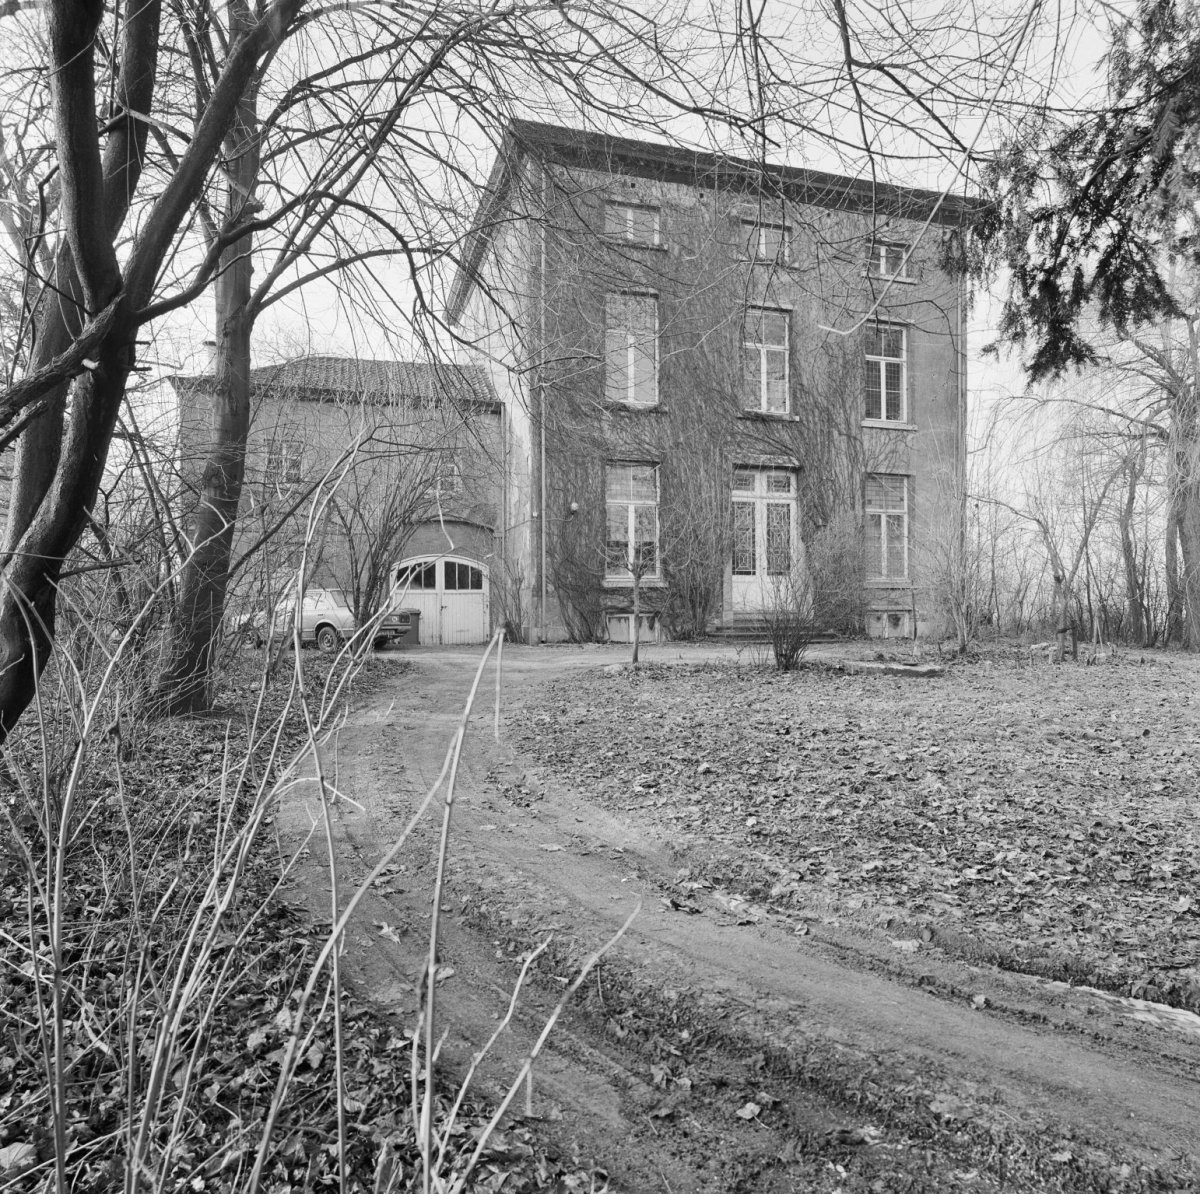 File exterieur huis voorgevel wijnandsrade 20282063 wikimedia commons - Huis exterieur ...